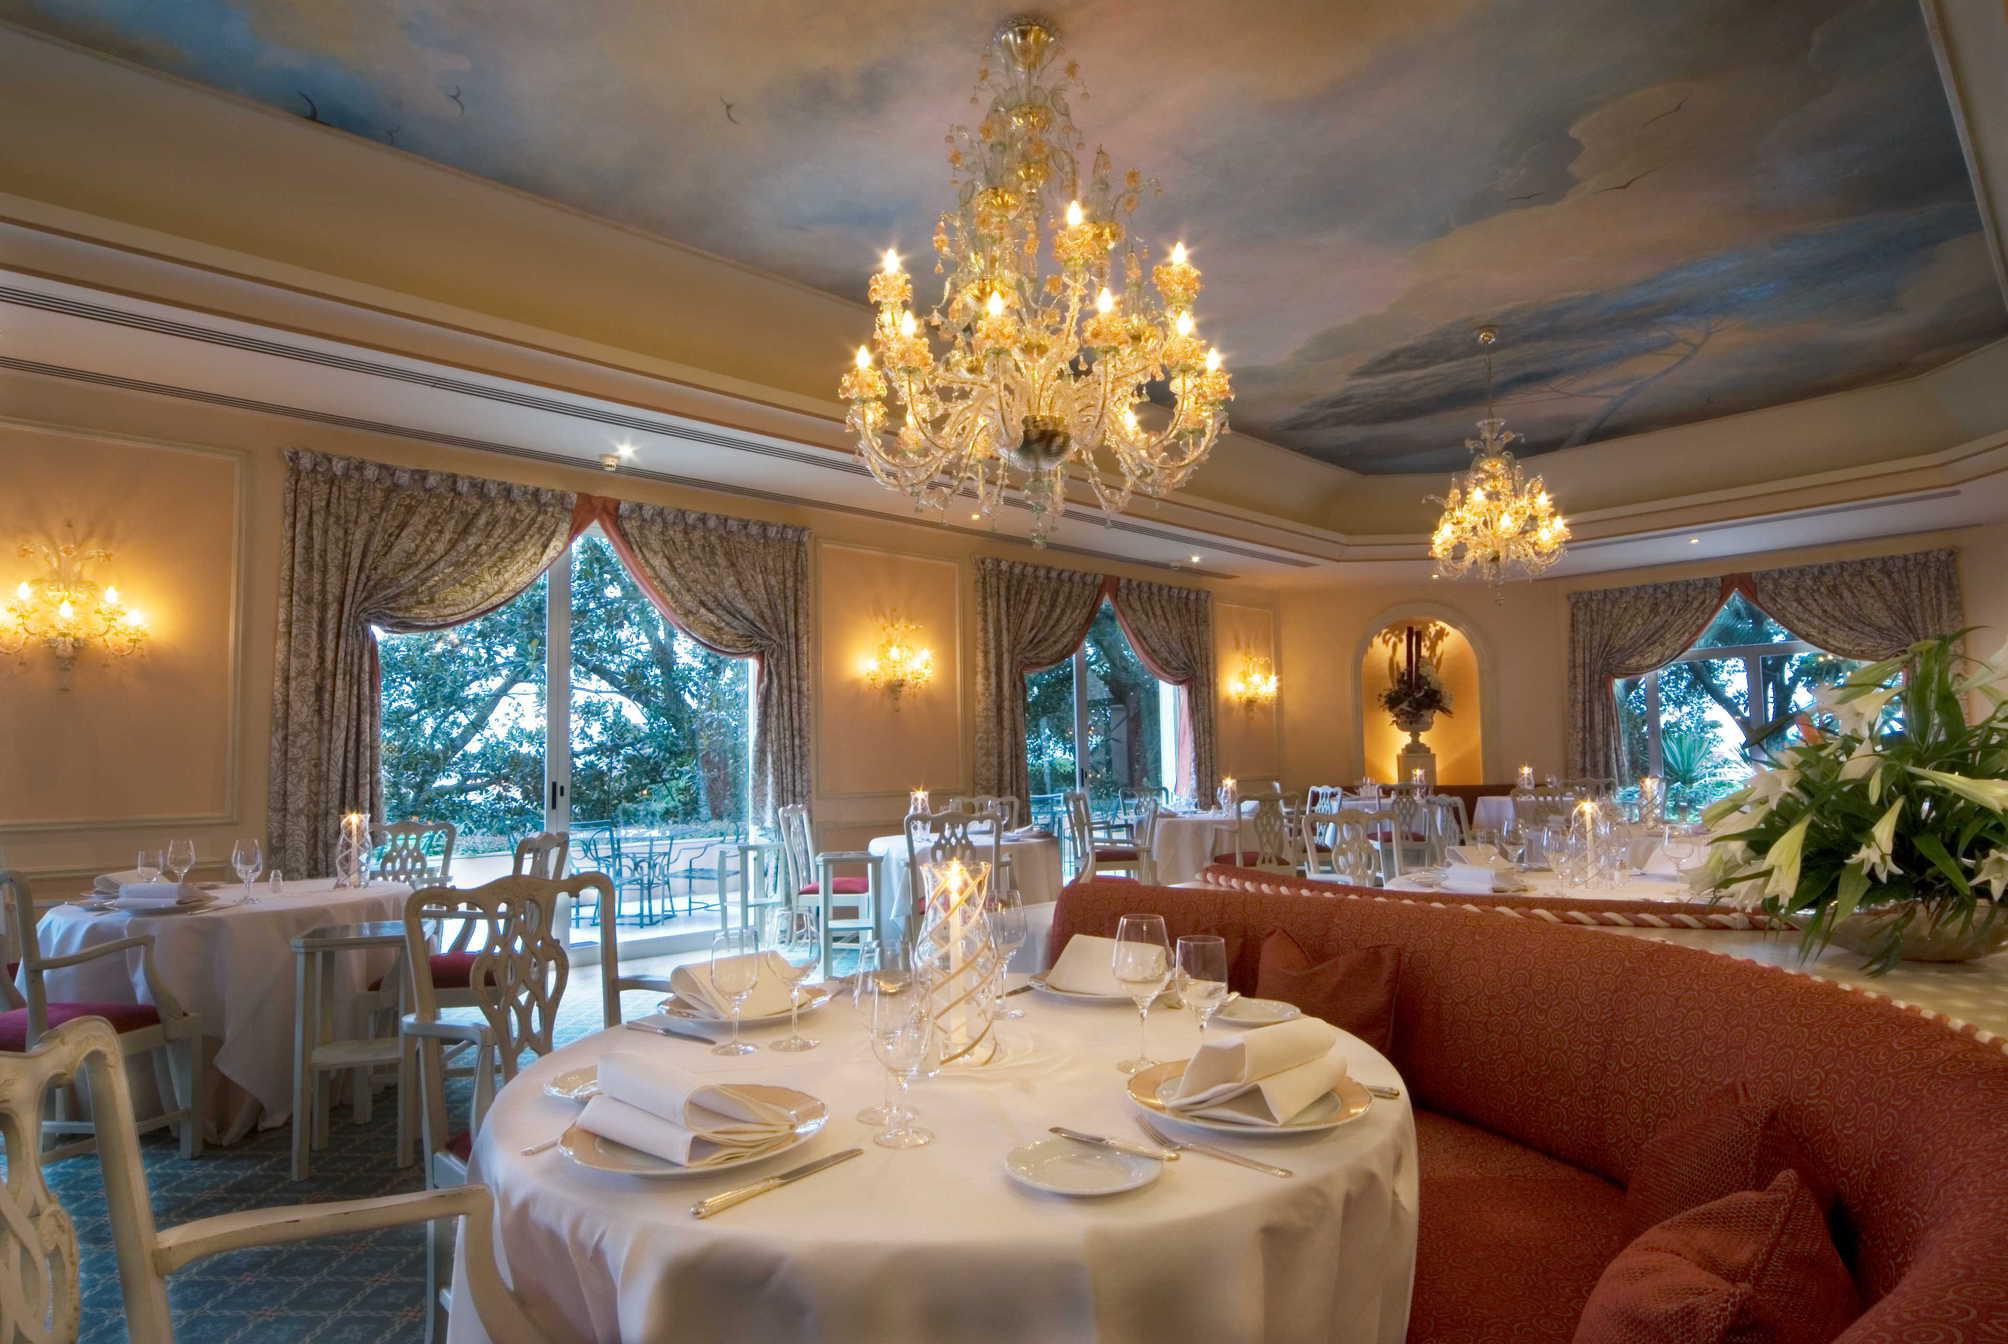 olissippo-lappalace-olissippo-lappalace-laprestaurant.jpg